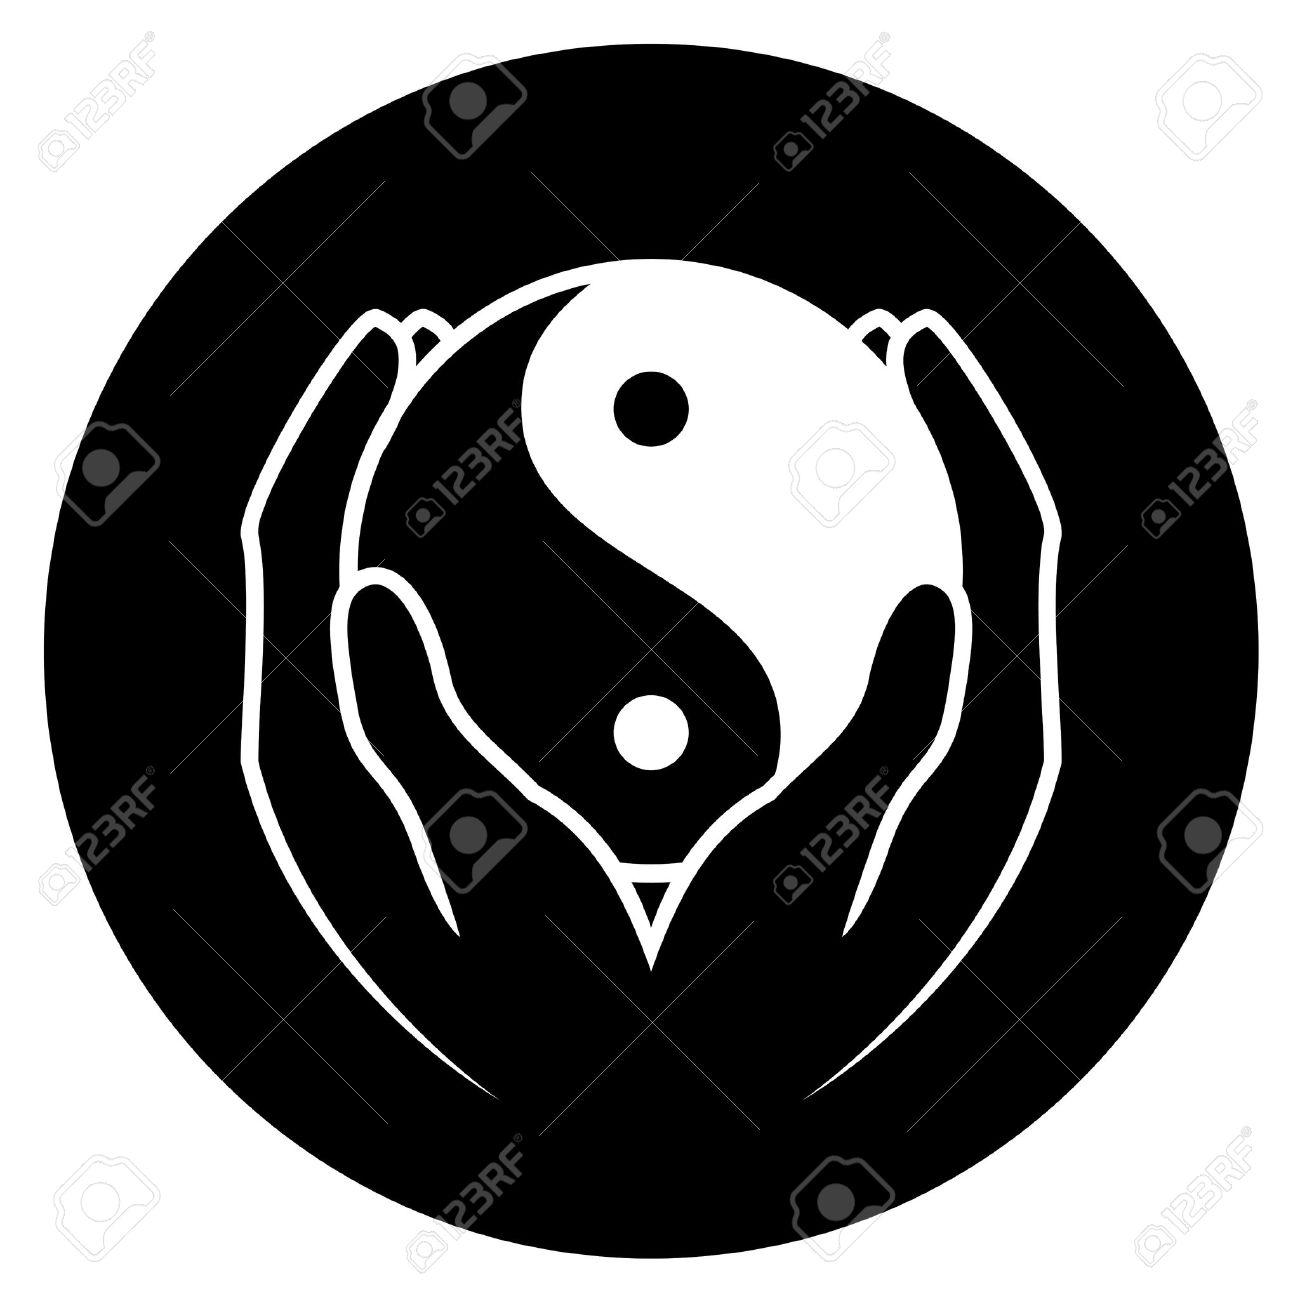 Vector illustration of hands holding yin yang symbol - 16331023